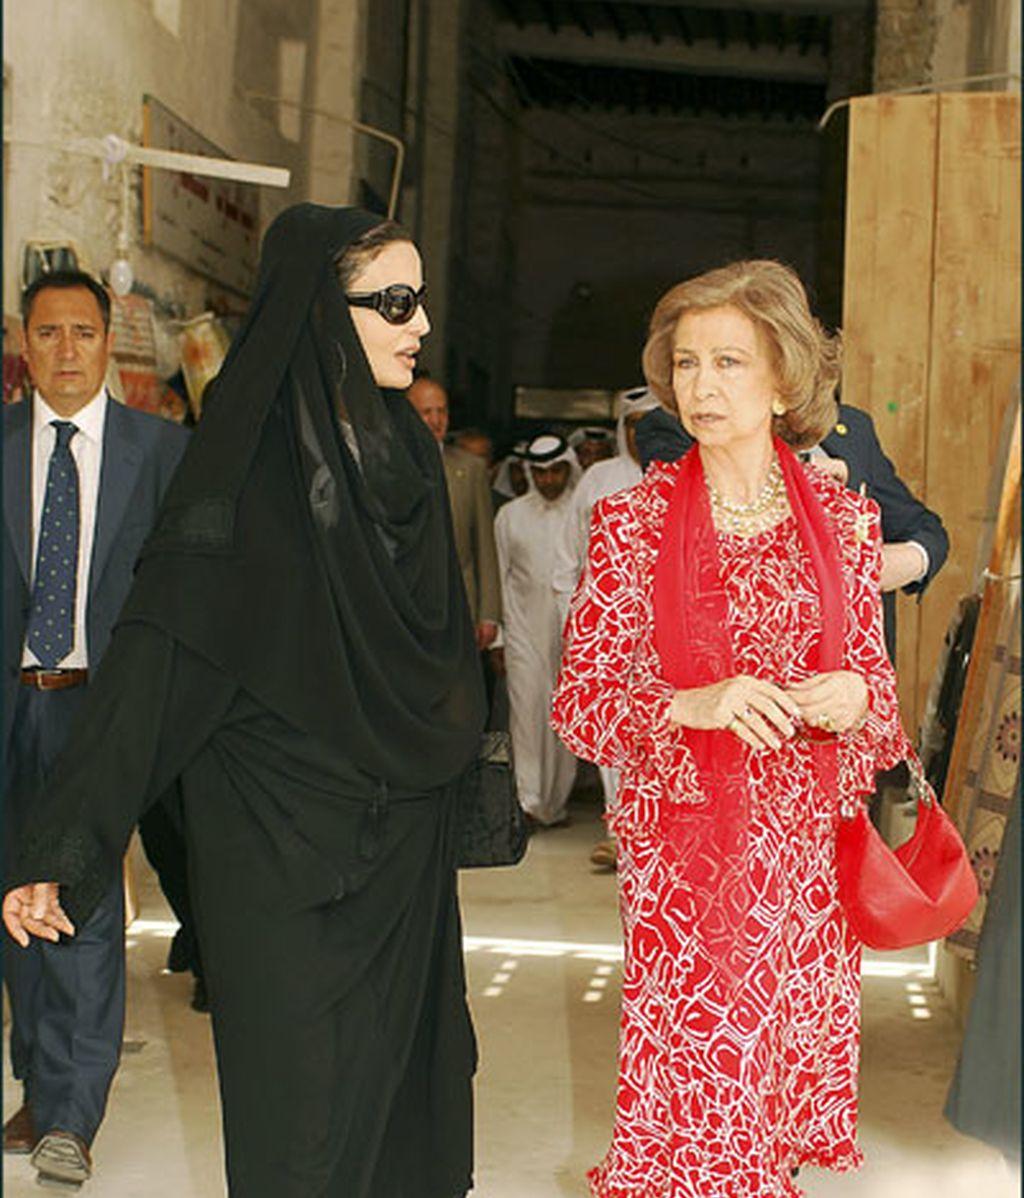 Visita de la reina a Catar